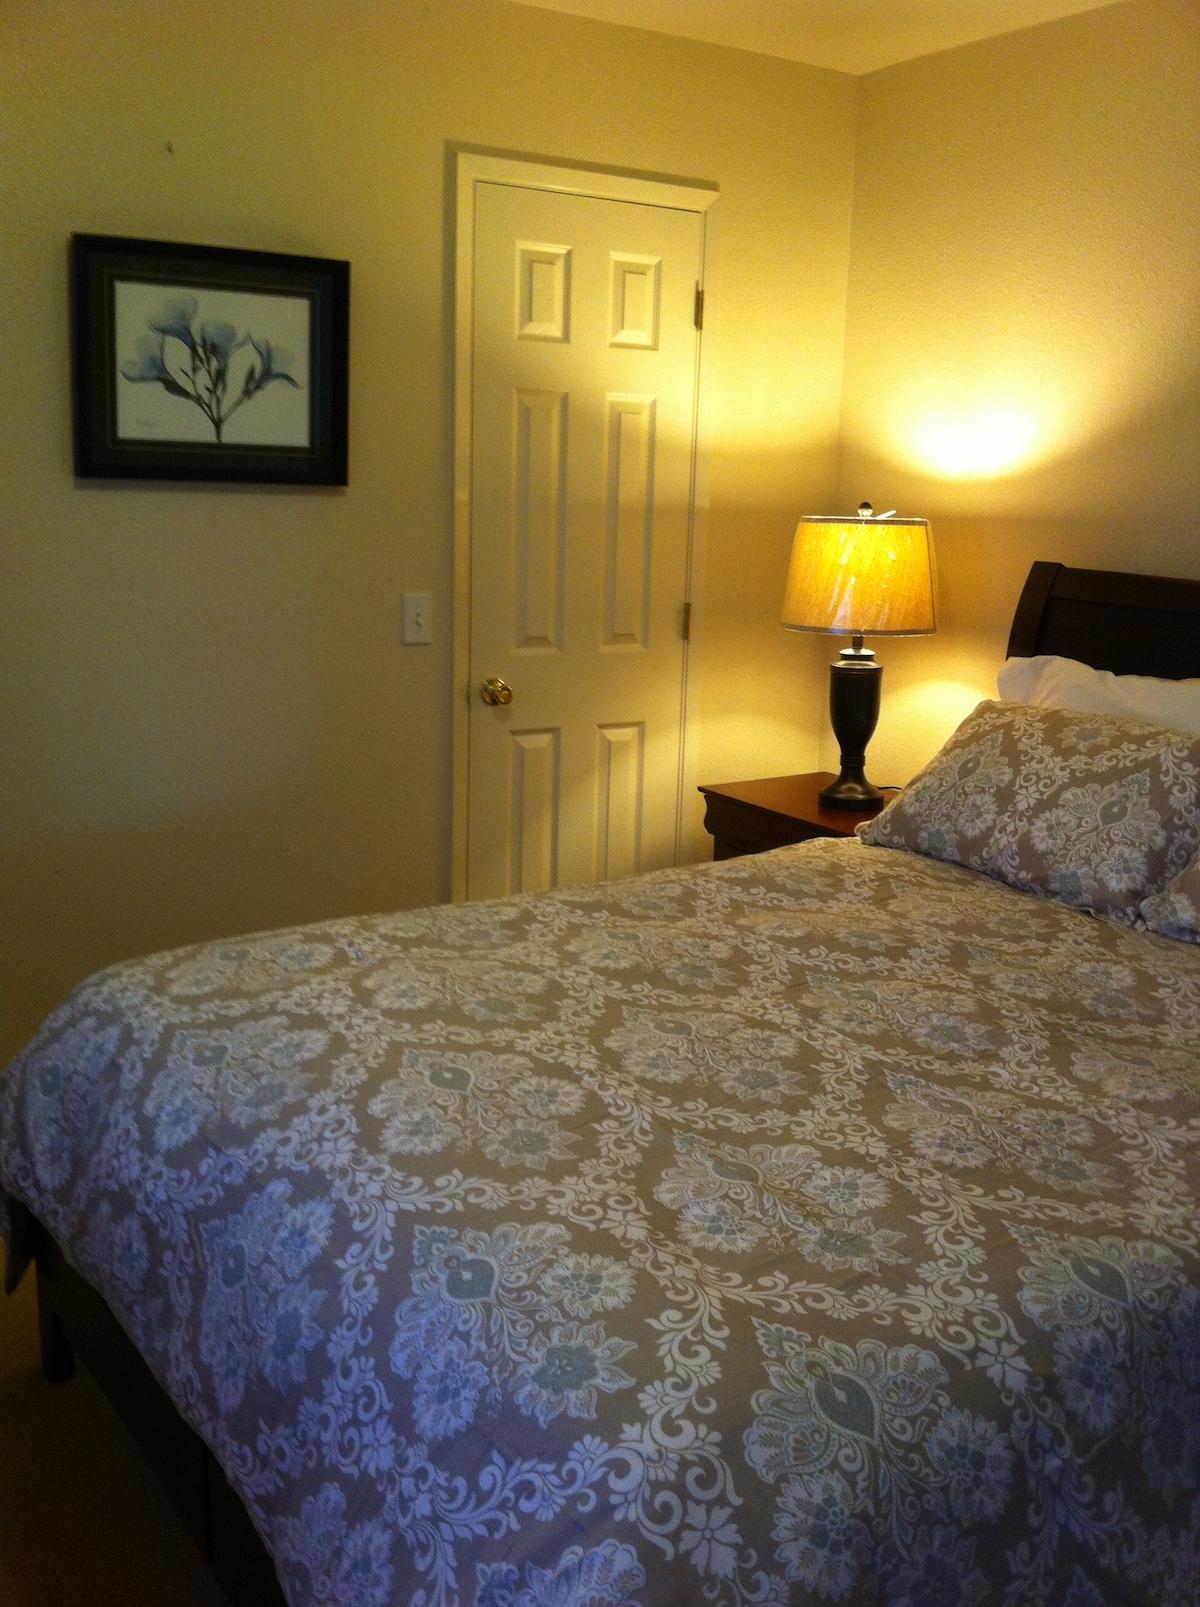 2 Bedrooms w/ 1 Bath